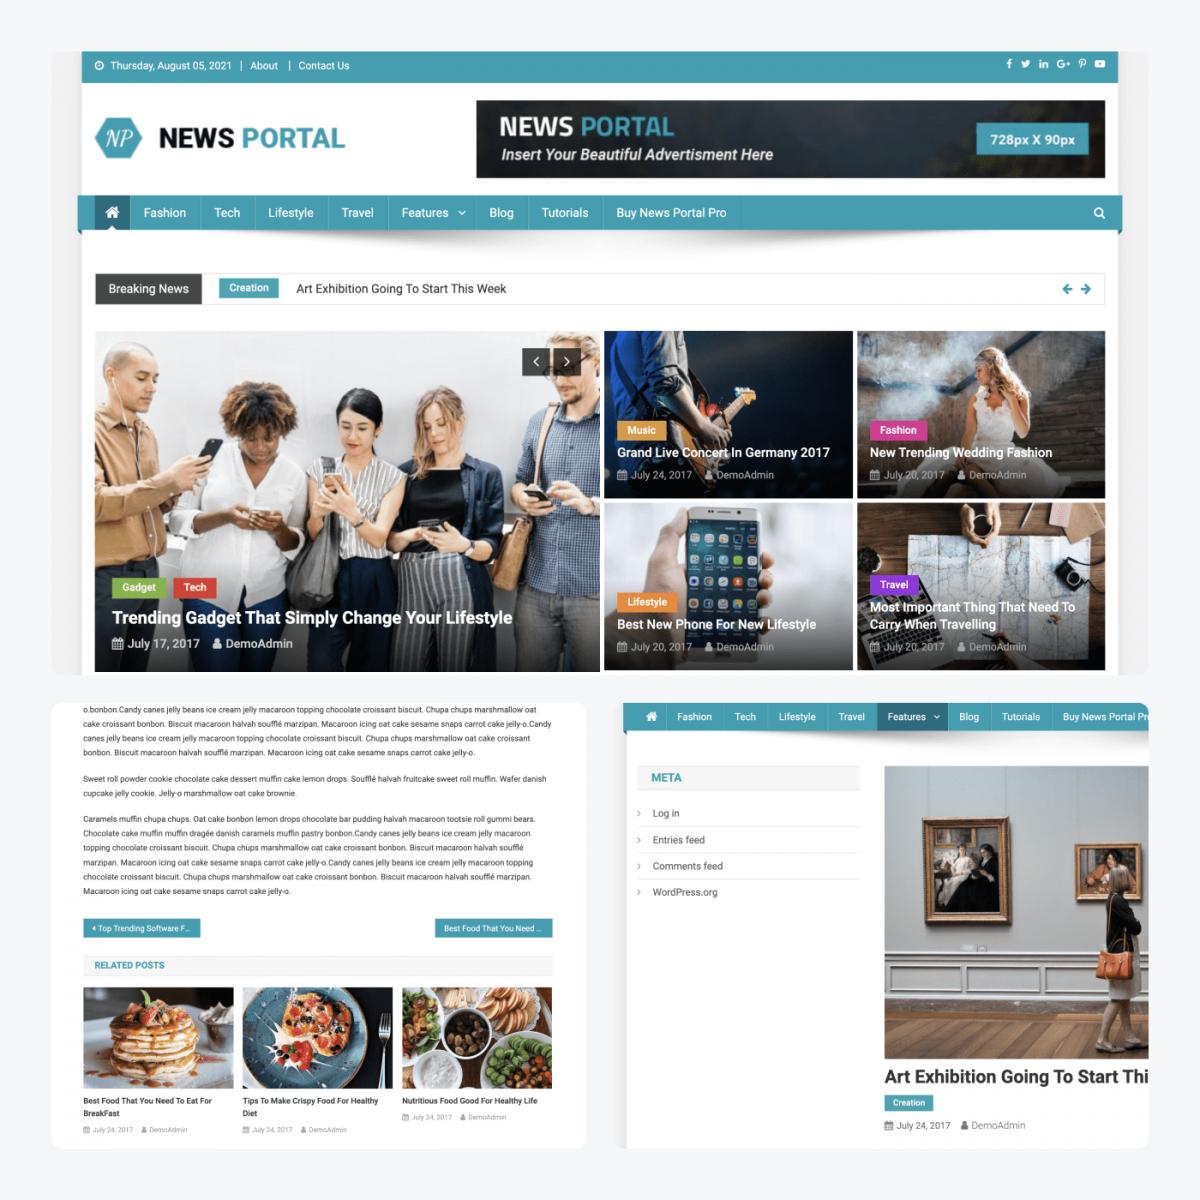 News Portal theme demo